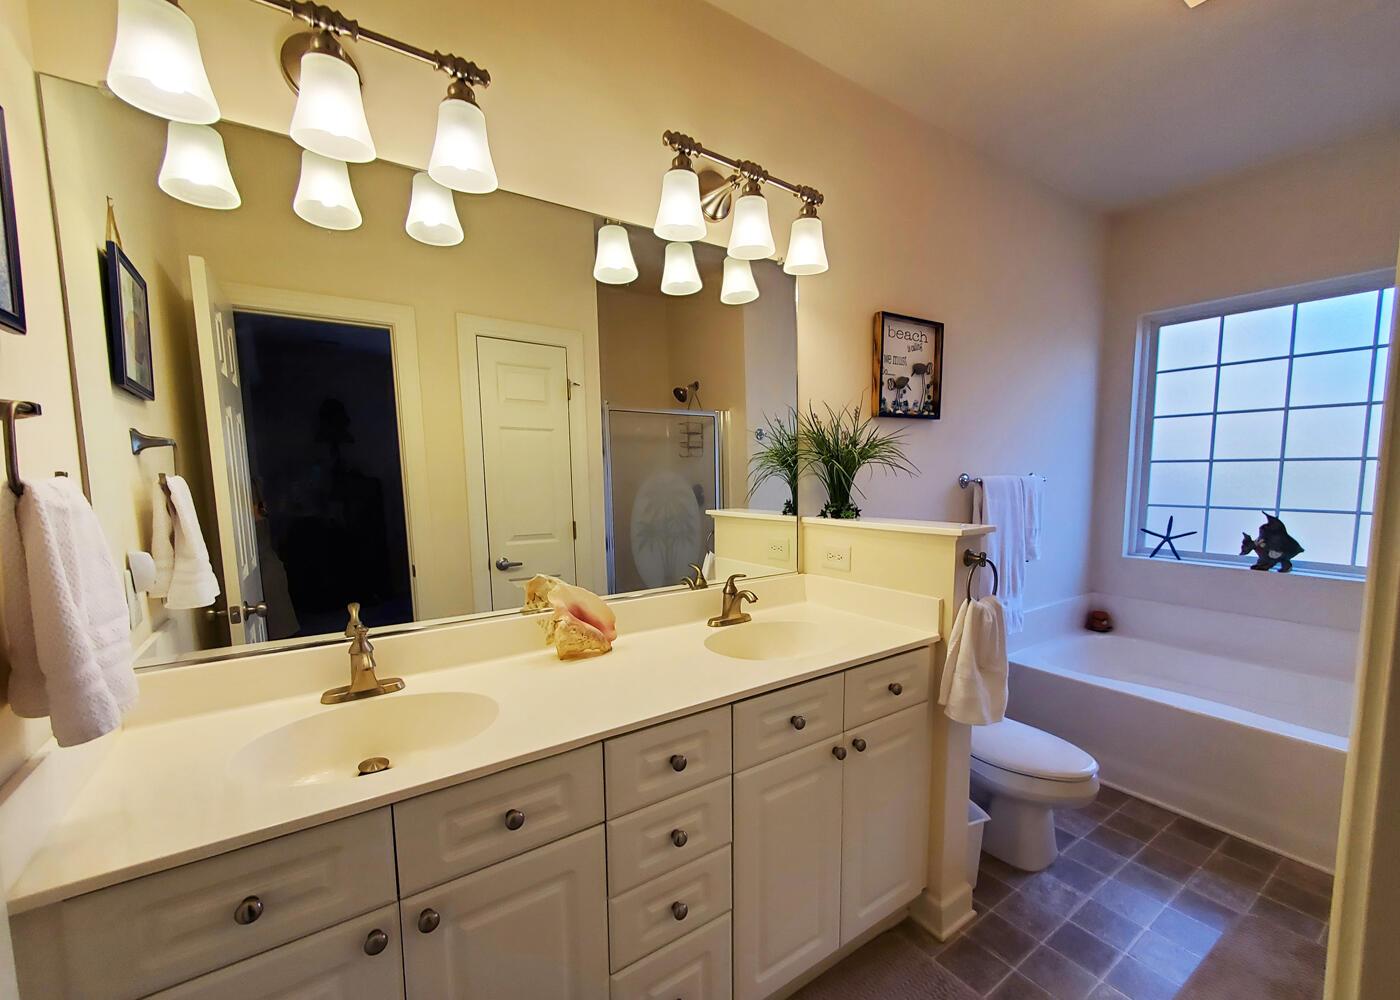 Grand Oaks Plantation Homes For Sale - 1607 Whitby, Charleston, SC - 6